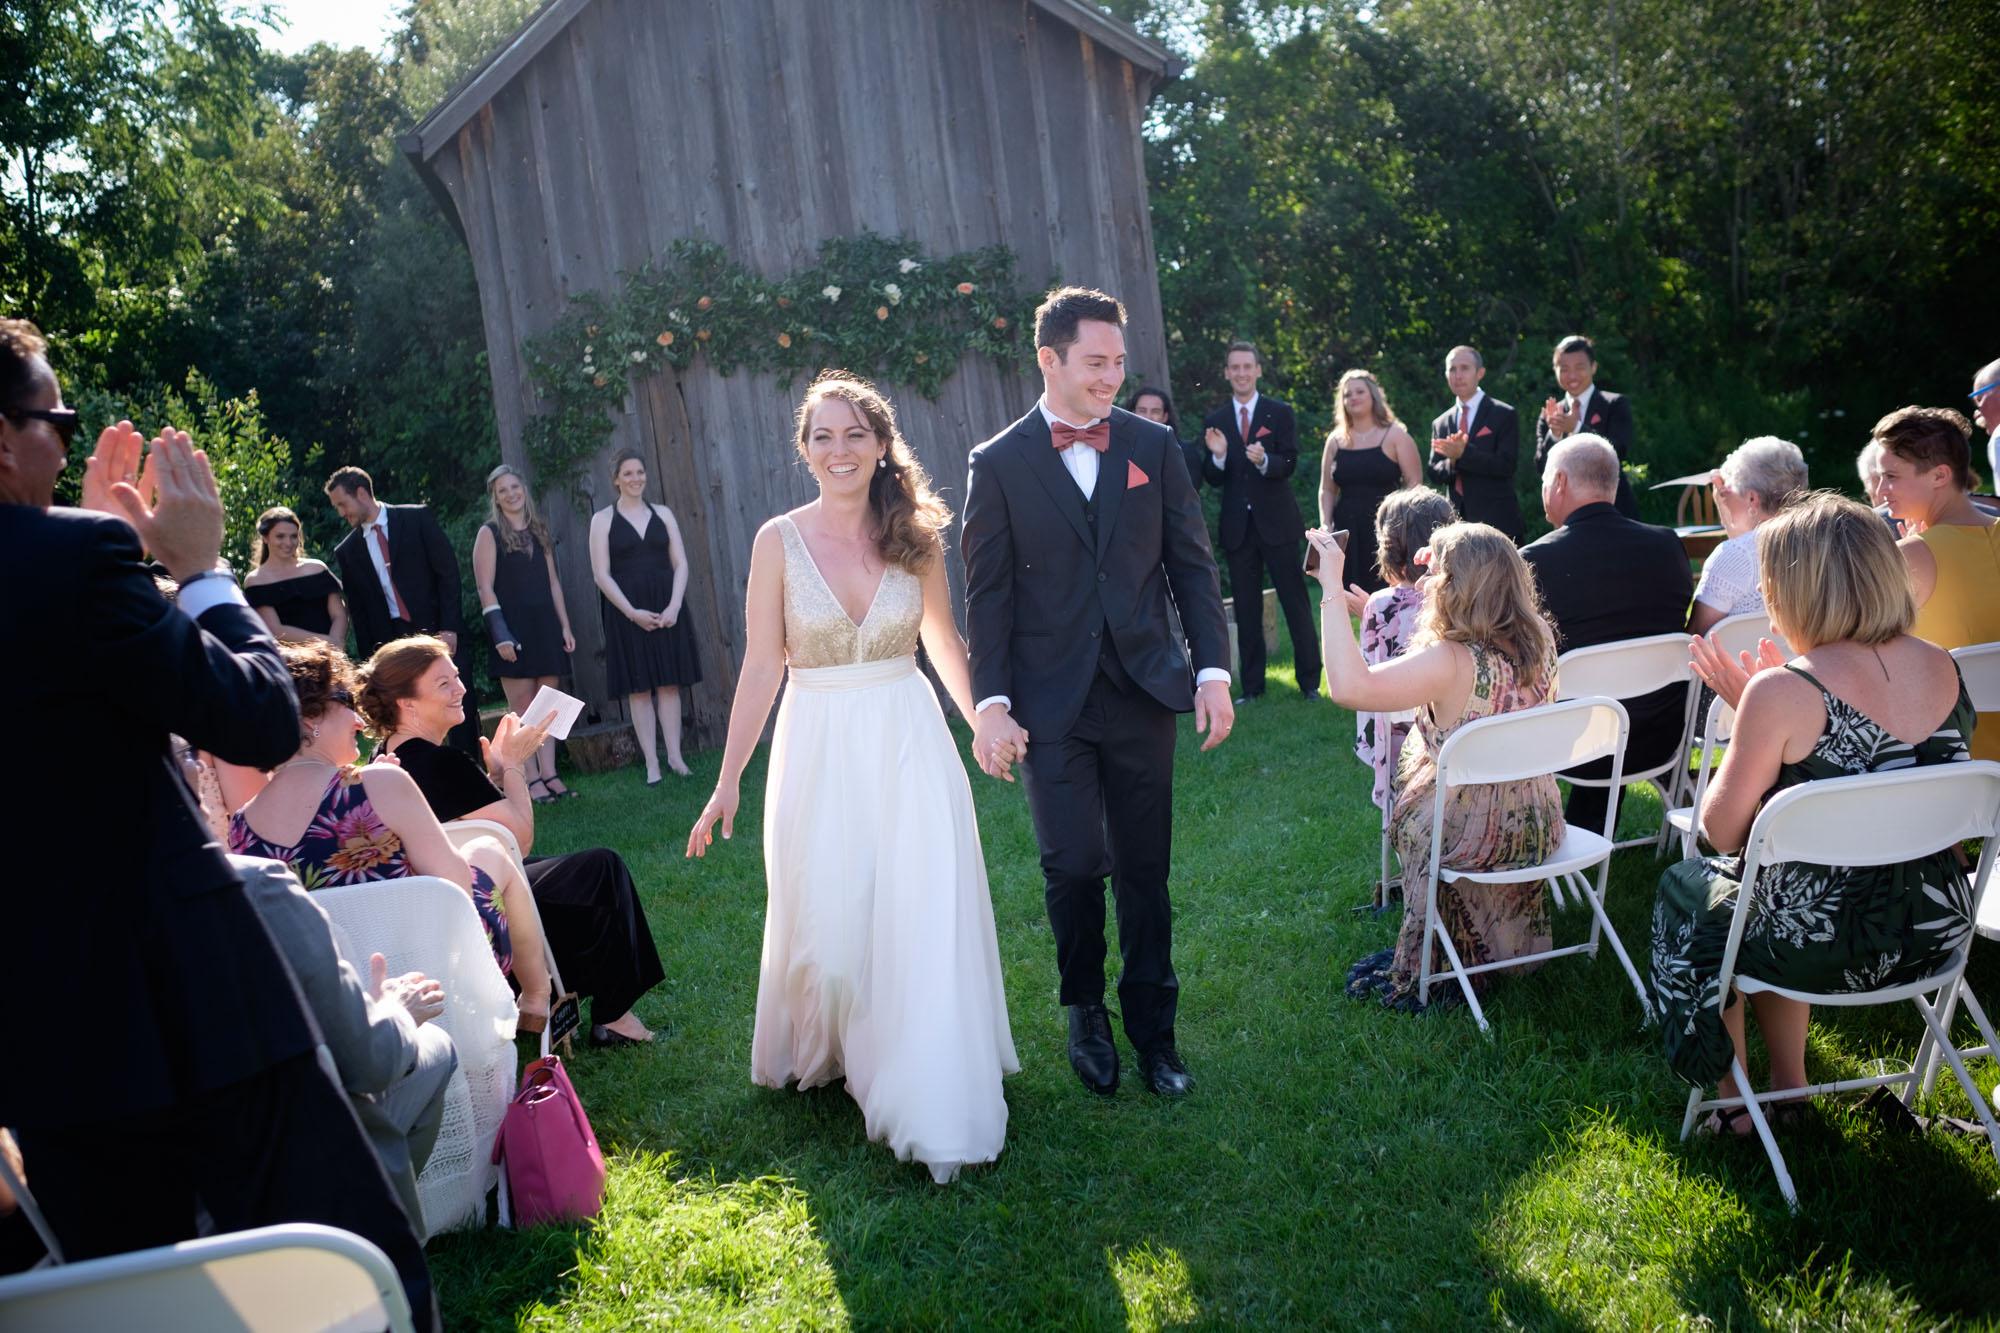 markham-museum-wedding-004.jpg